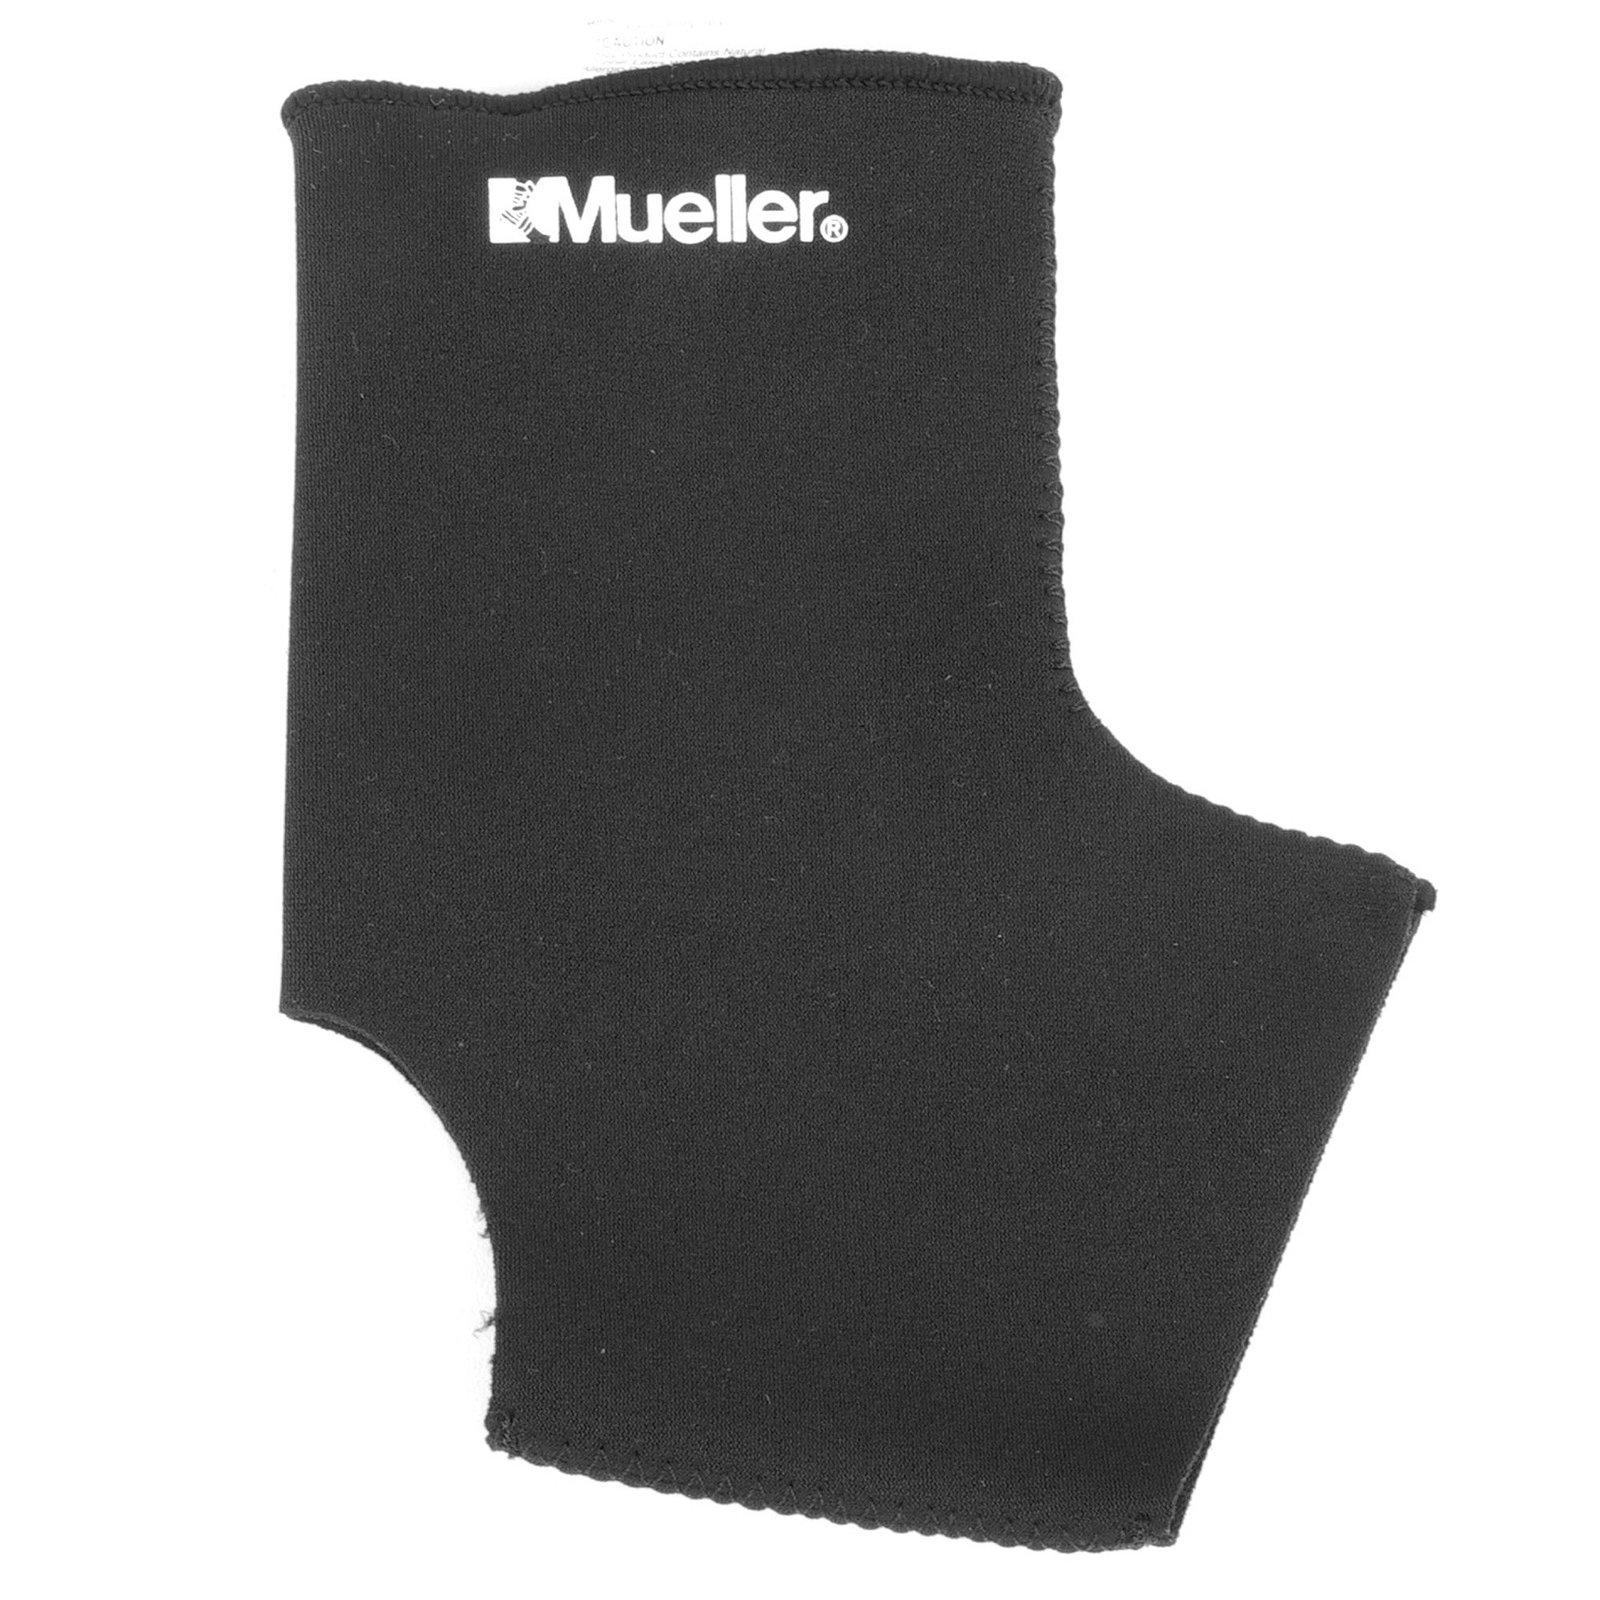 Mueller Ankle Support Neoprene Blend, Black, Large